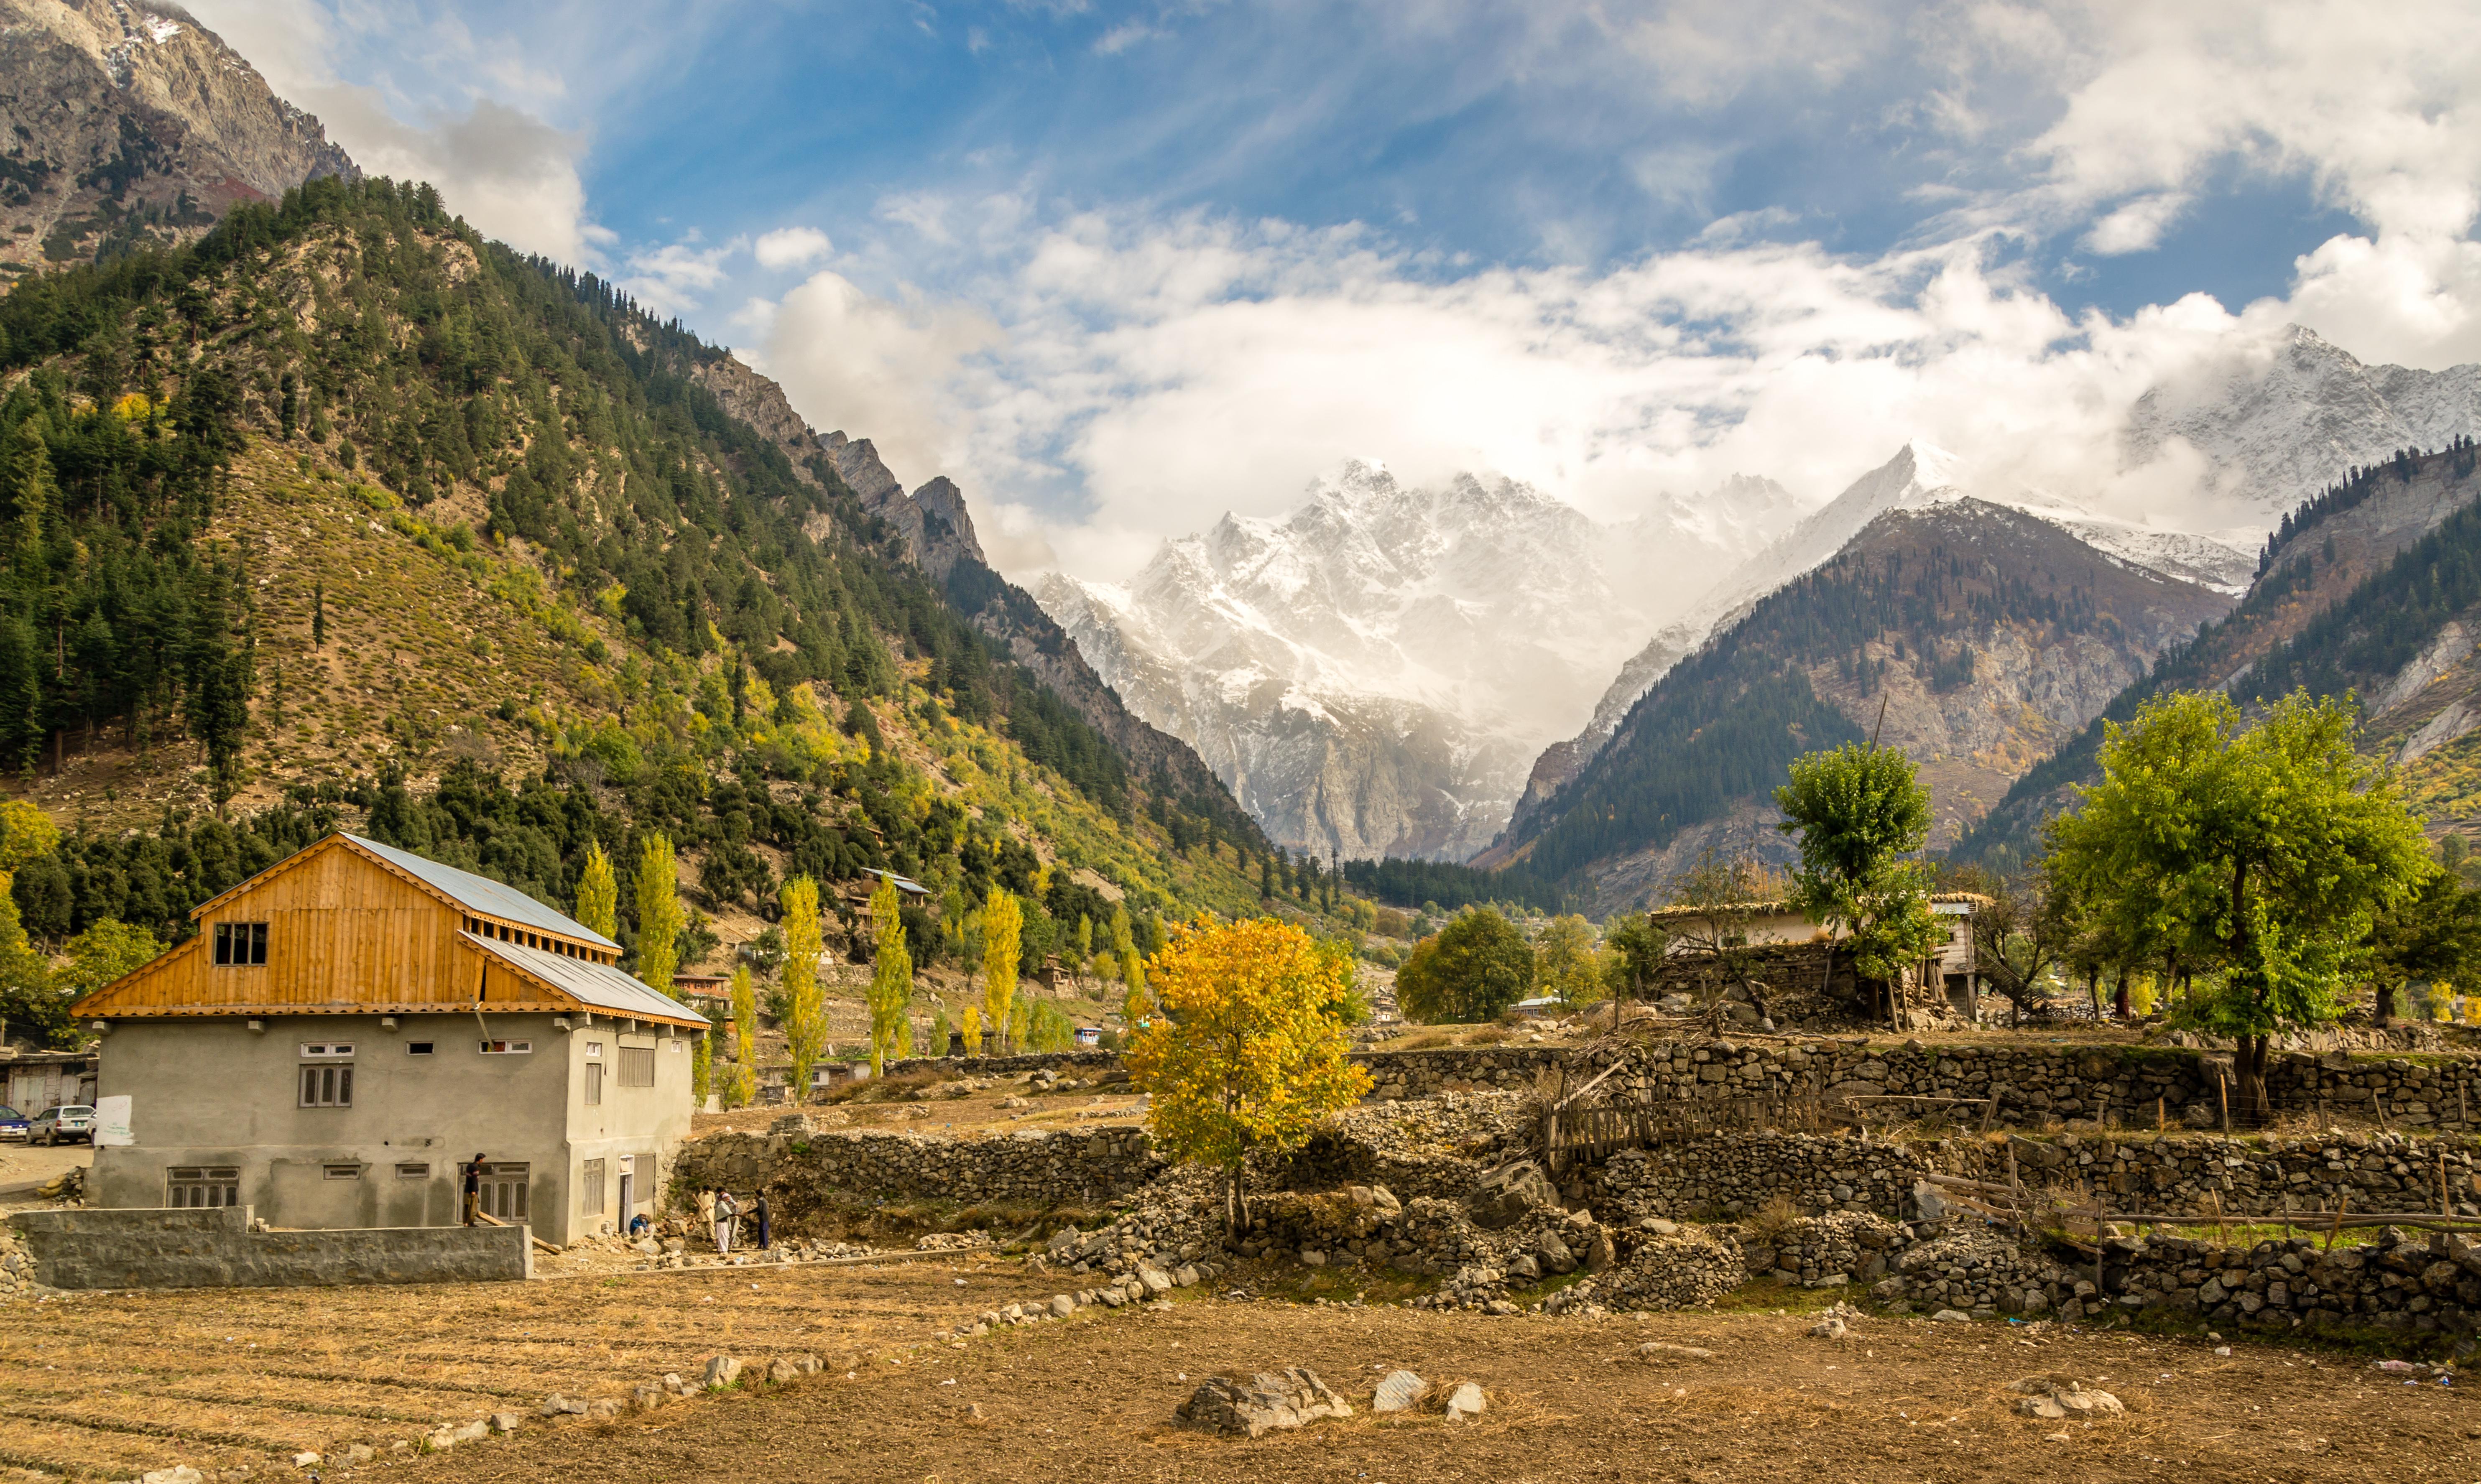 KPK Photo: File:Matilton Village, Swat, KPK.JPG